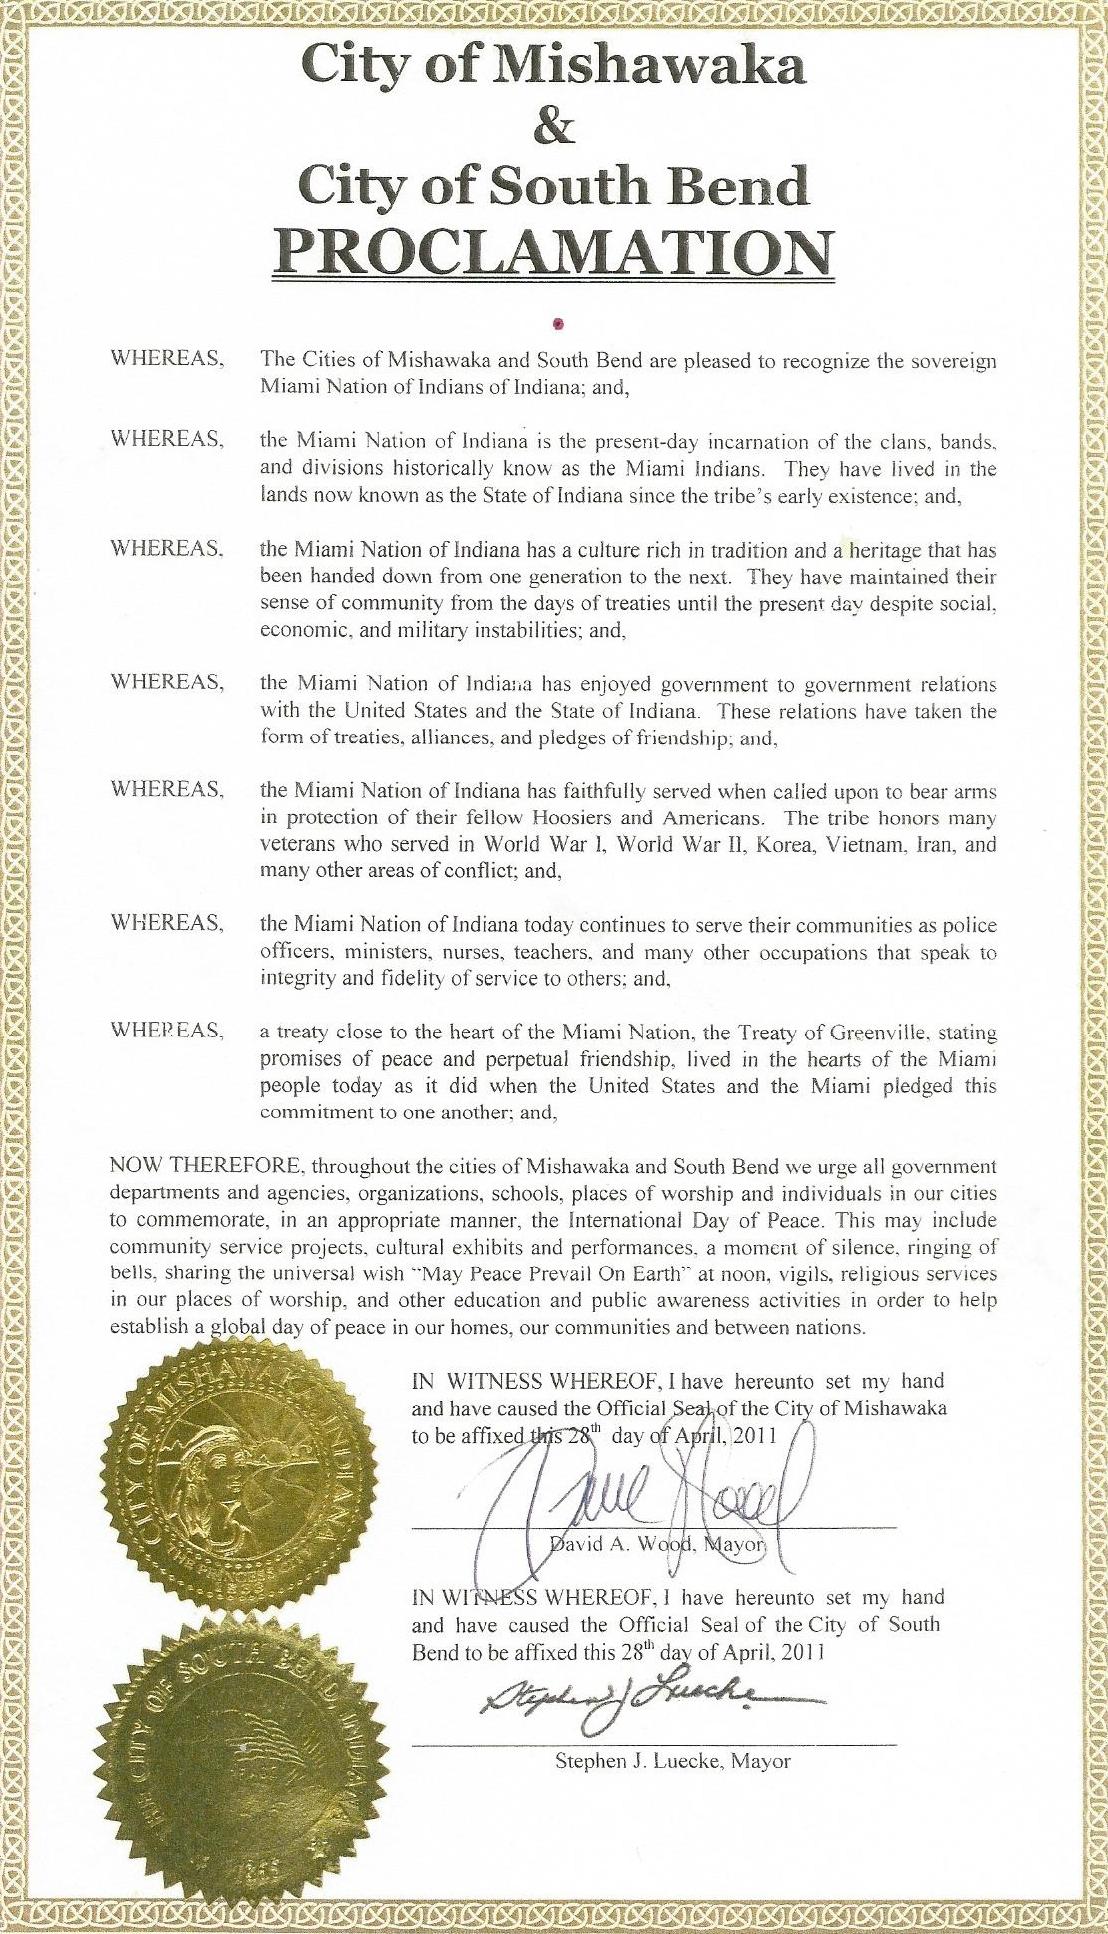 Proclamation City of Mishawaka & City of South Bend.jpg